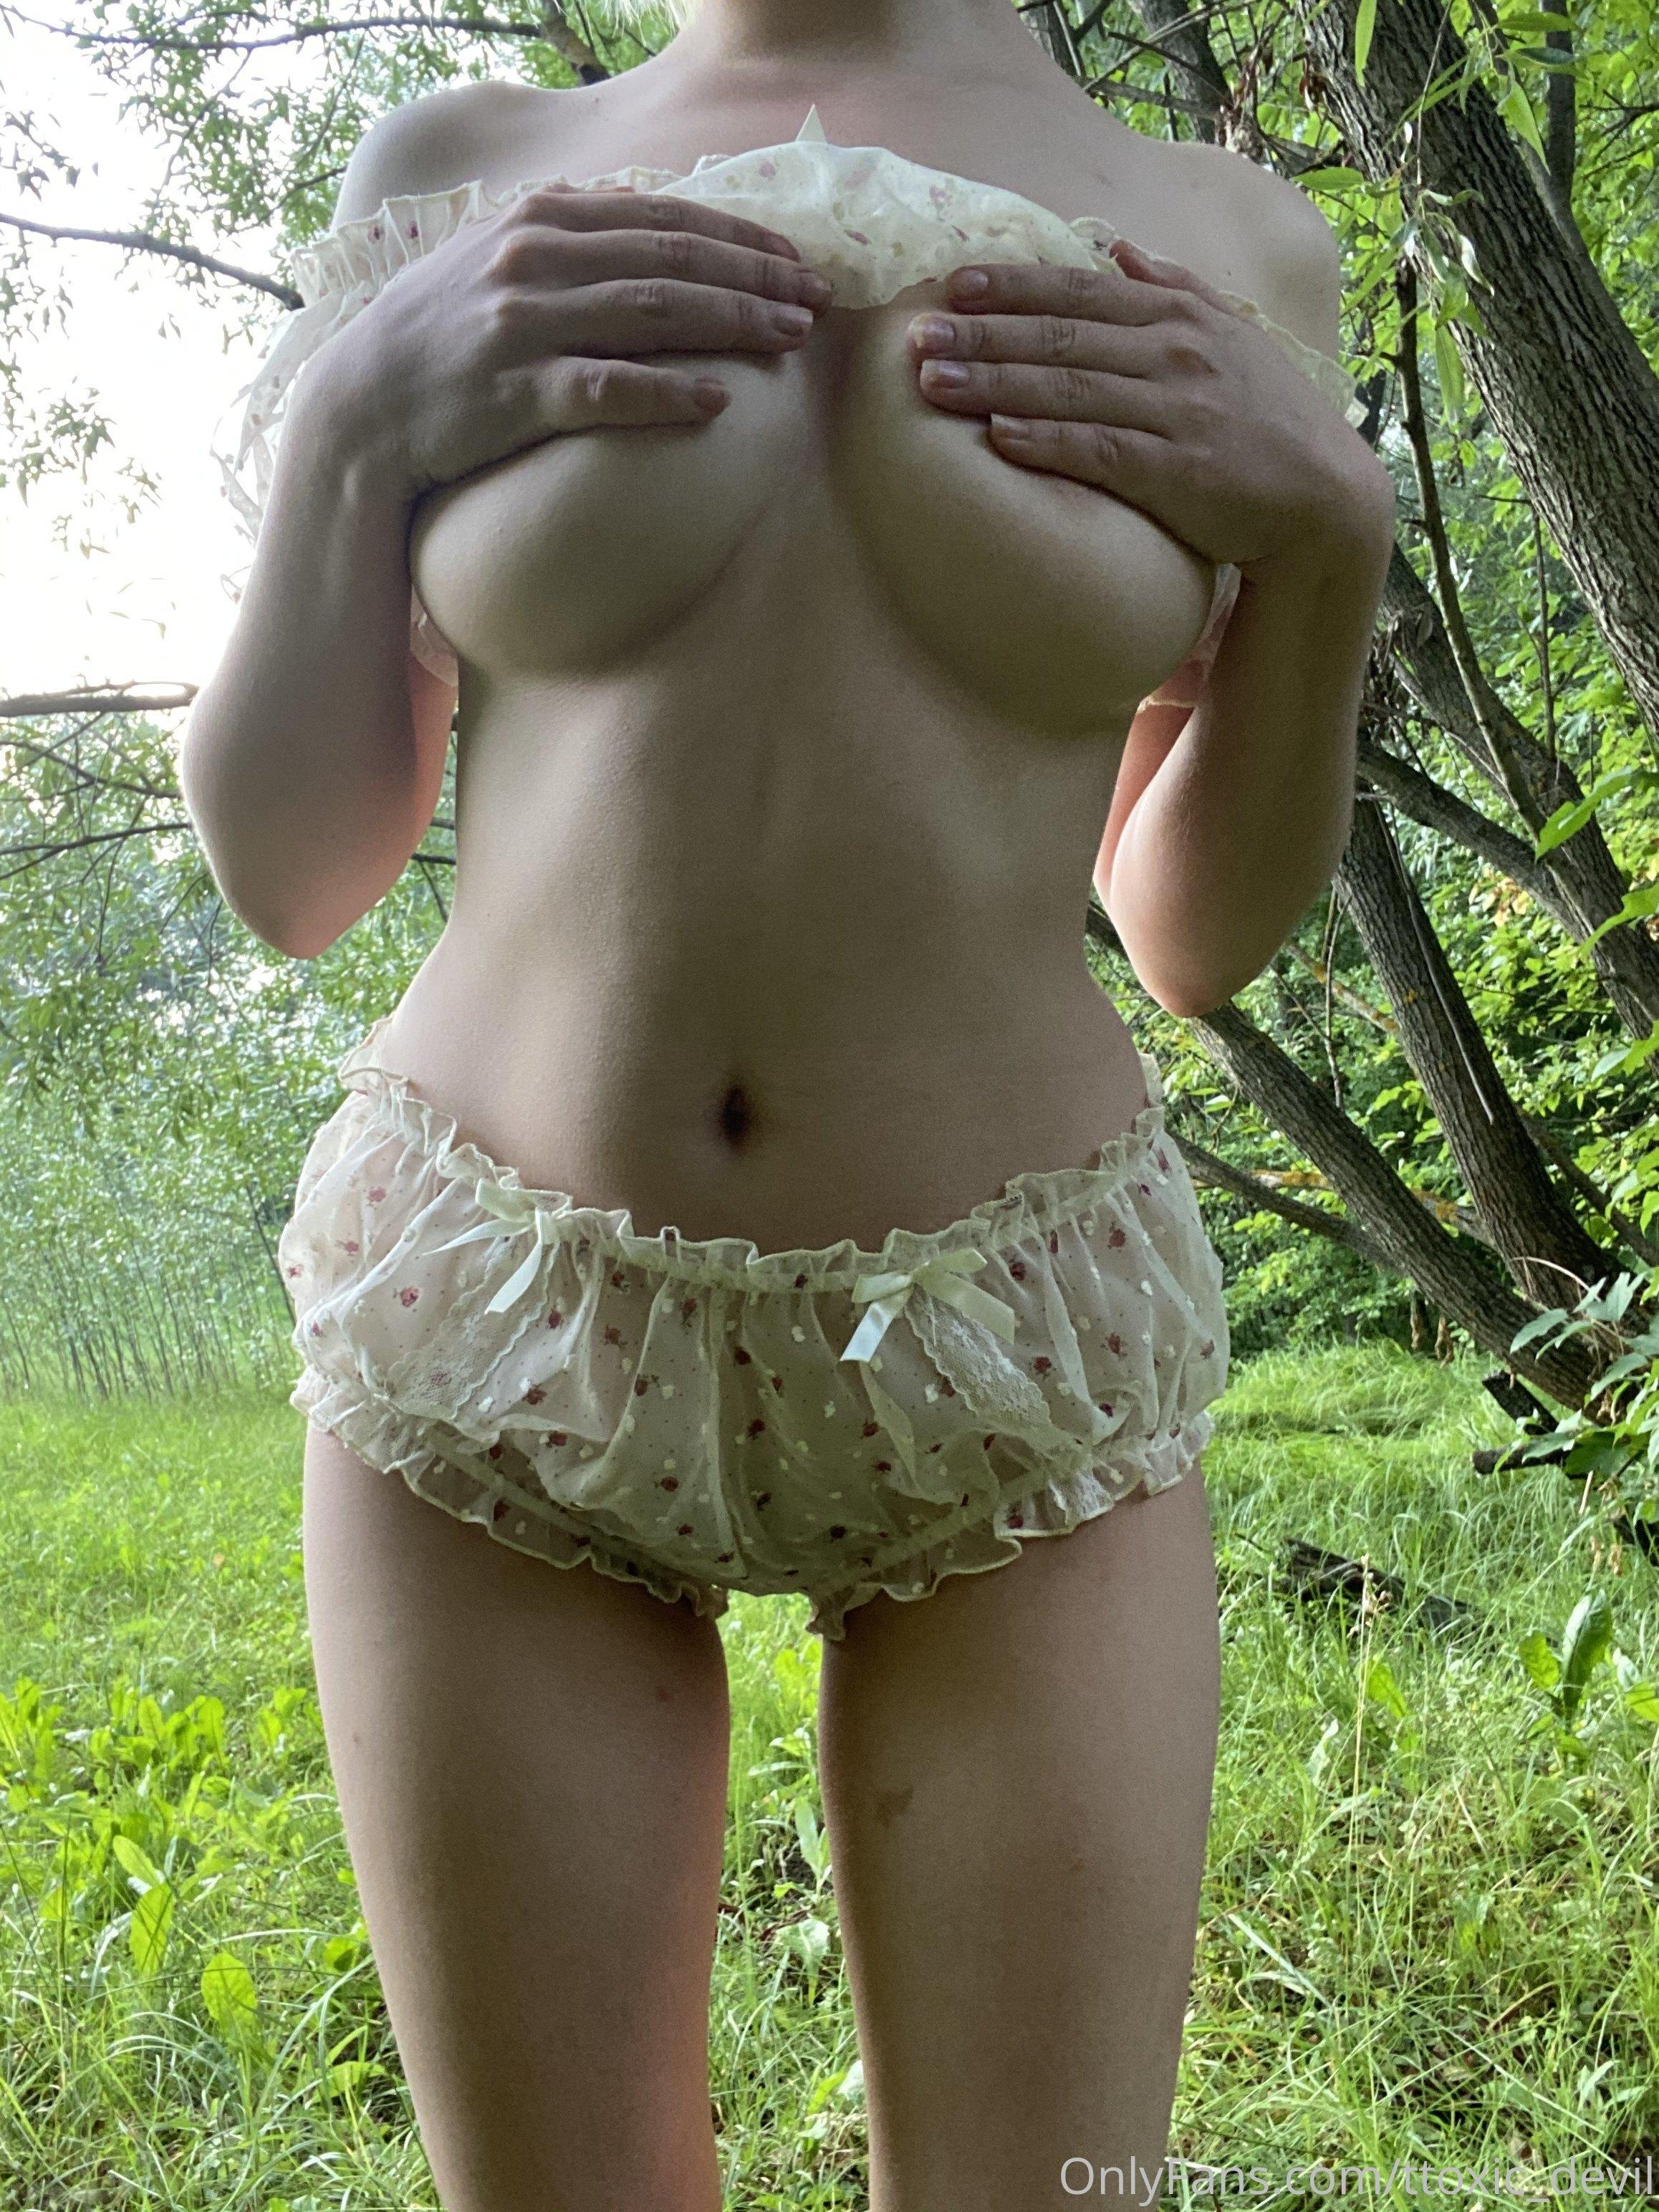 Anna, Ttoxic Devil, Onlyfans 0045